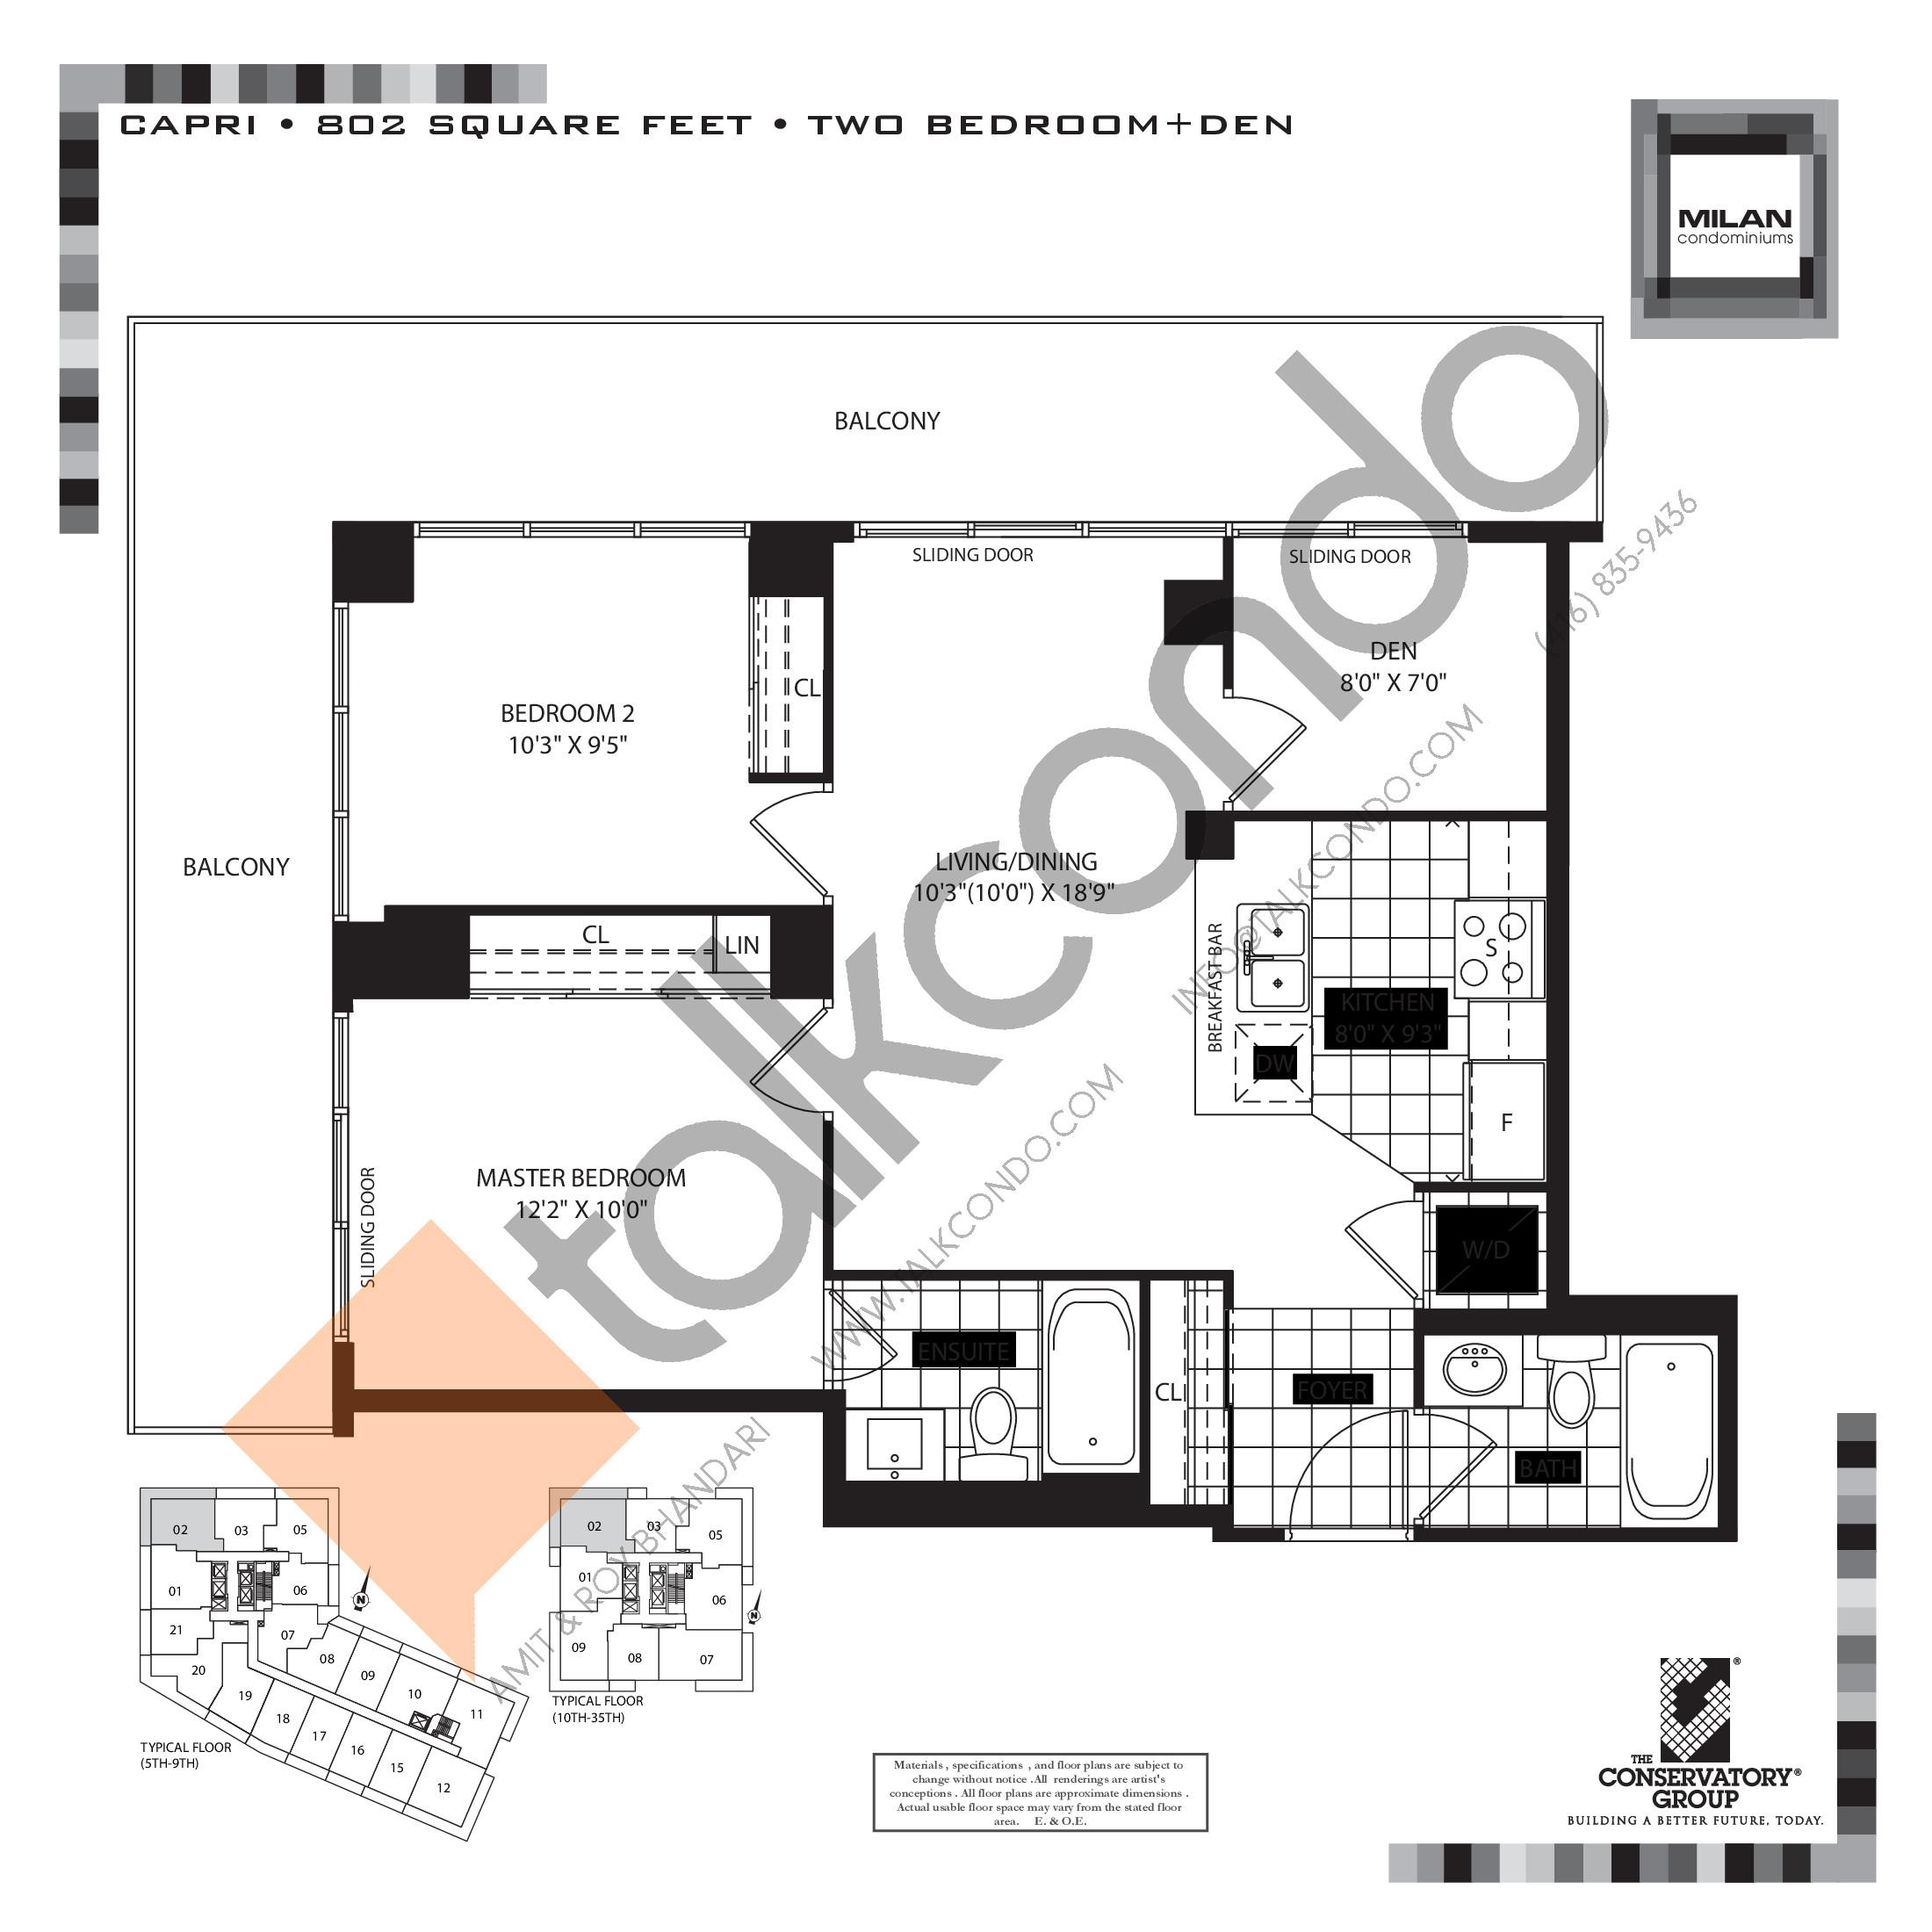 Milan Condos Floor Plans Prices Availability Talkcondo